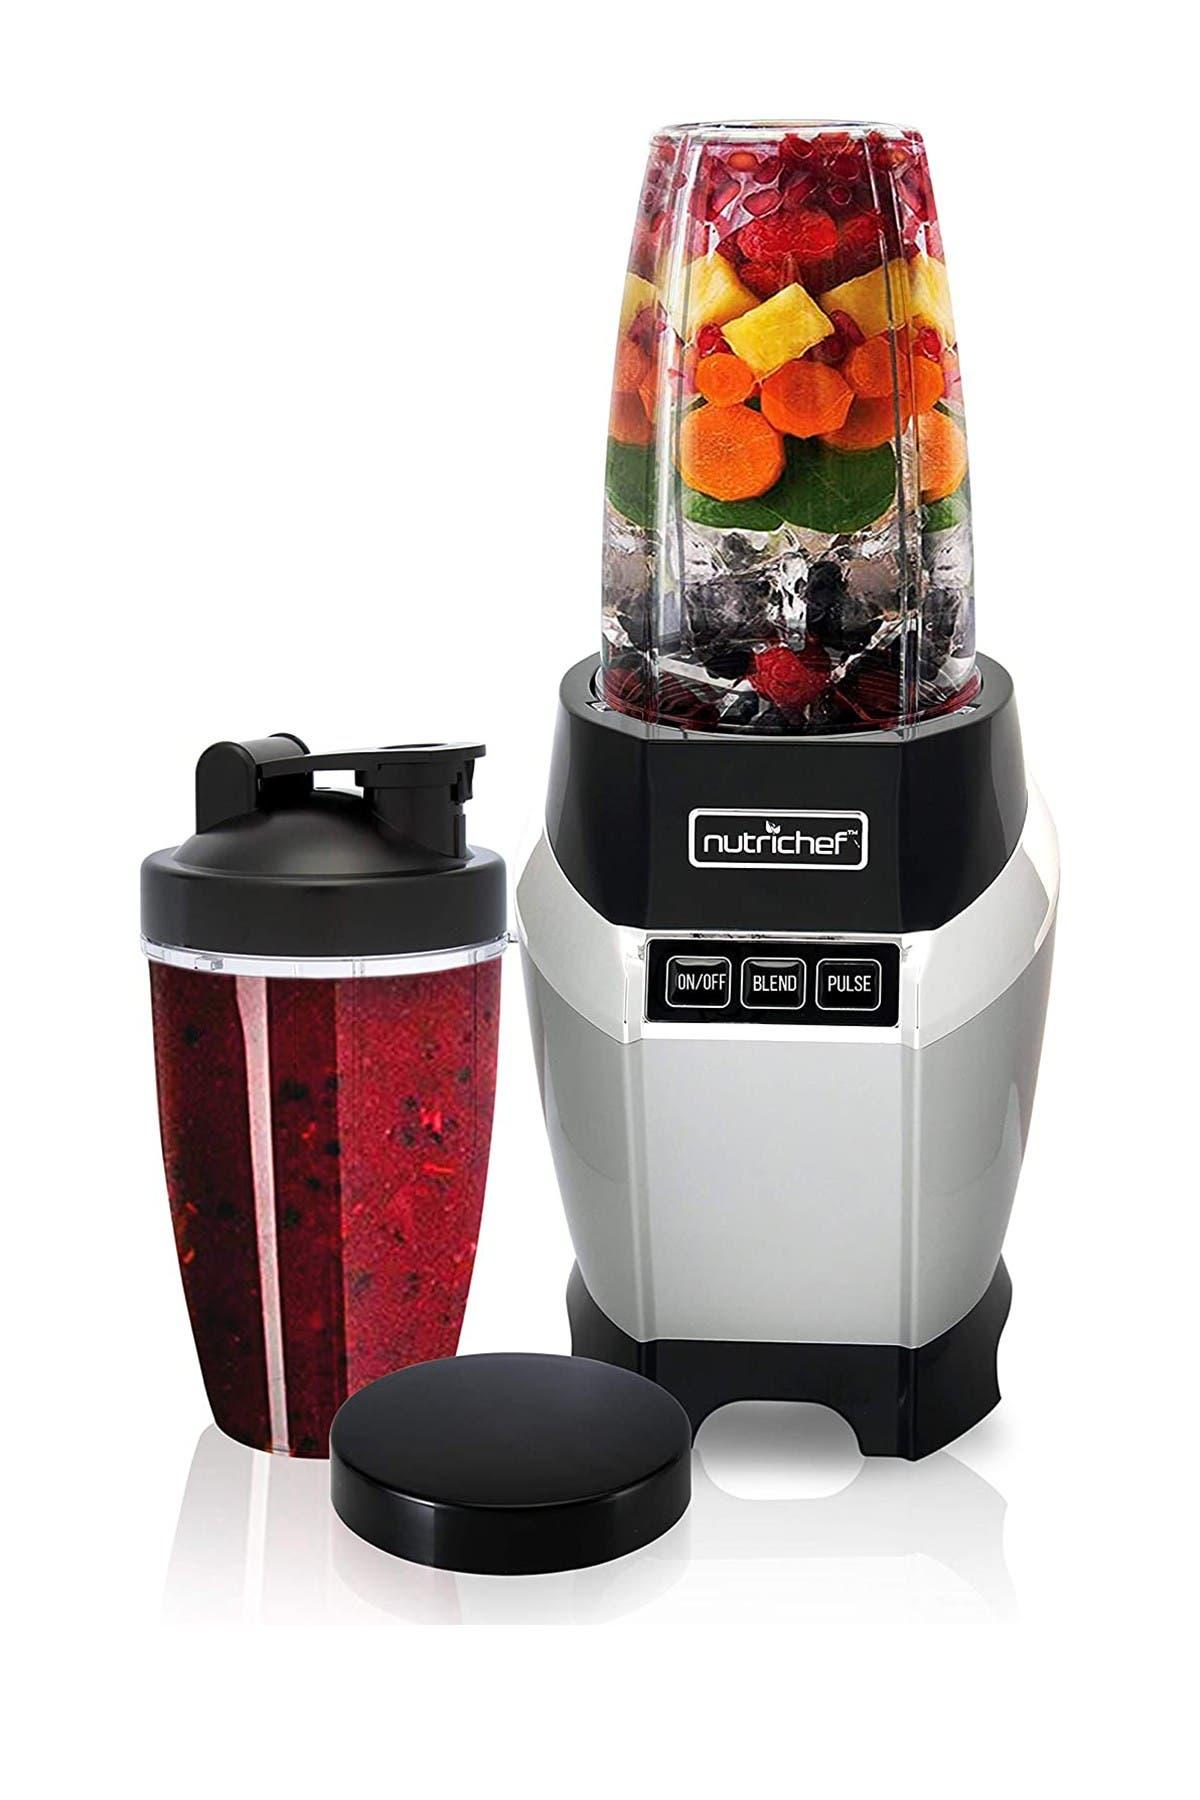 Image of NutriChef Professional Home Kitchen Blender - Digital Countertop Power Pro Blender with Pulse Blend